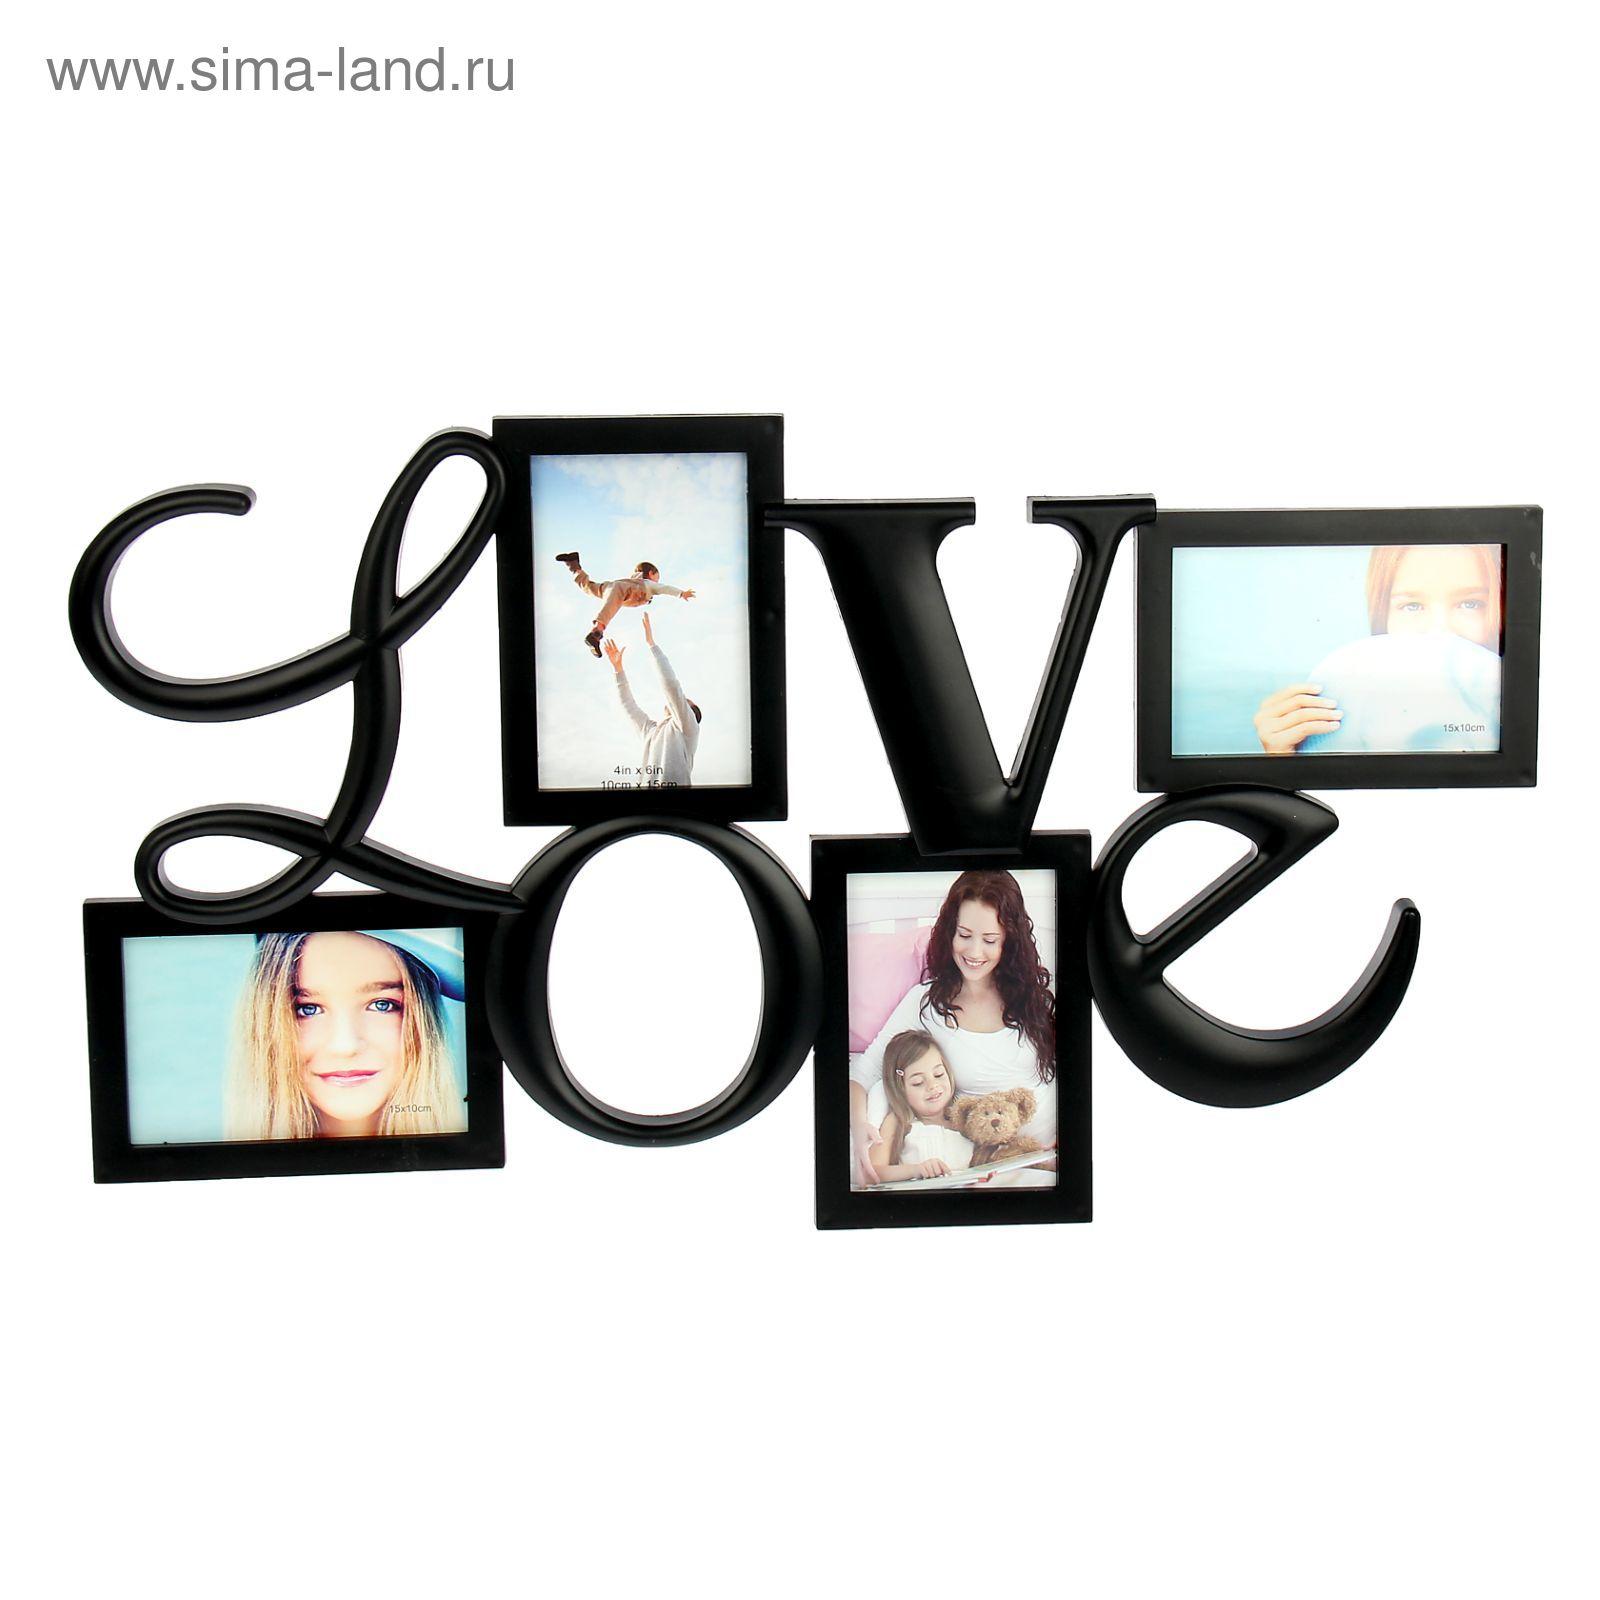 Фоторамка Love на 4 фото 10х15 см (806419) - Купить по цене от ... eb4e501c069fe